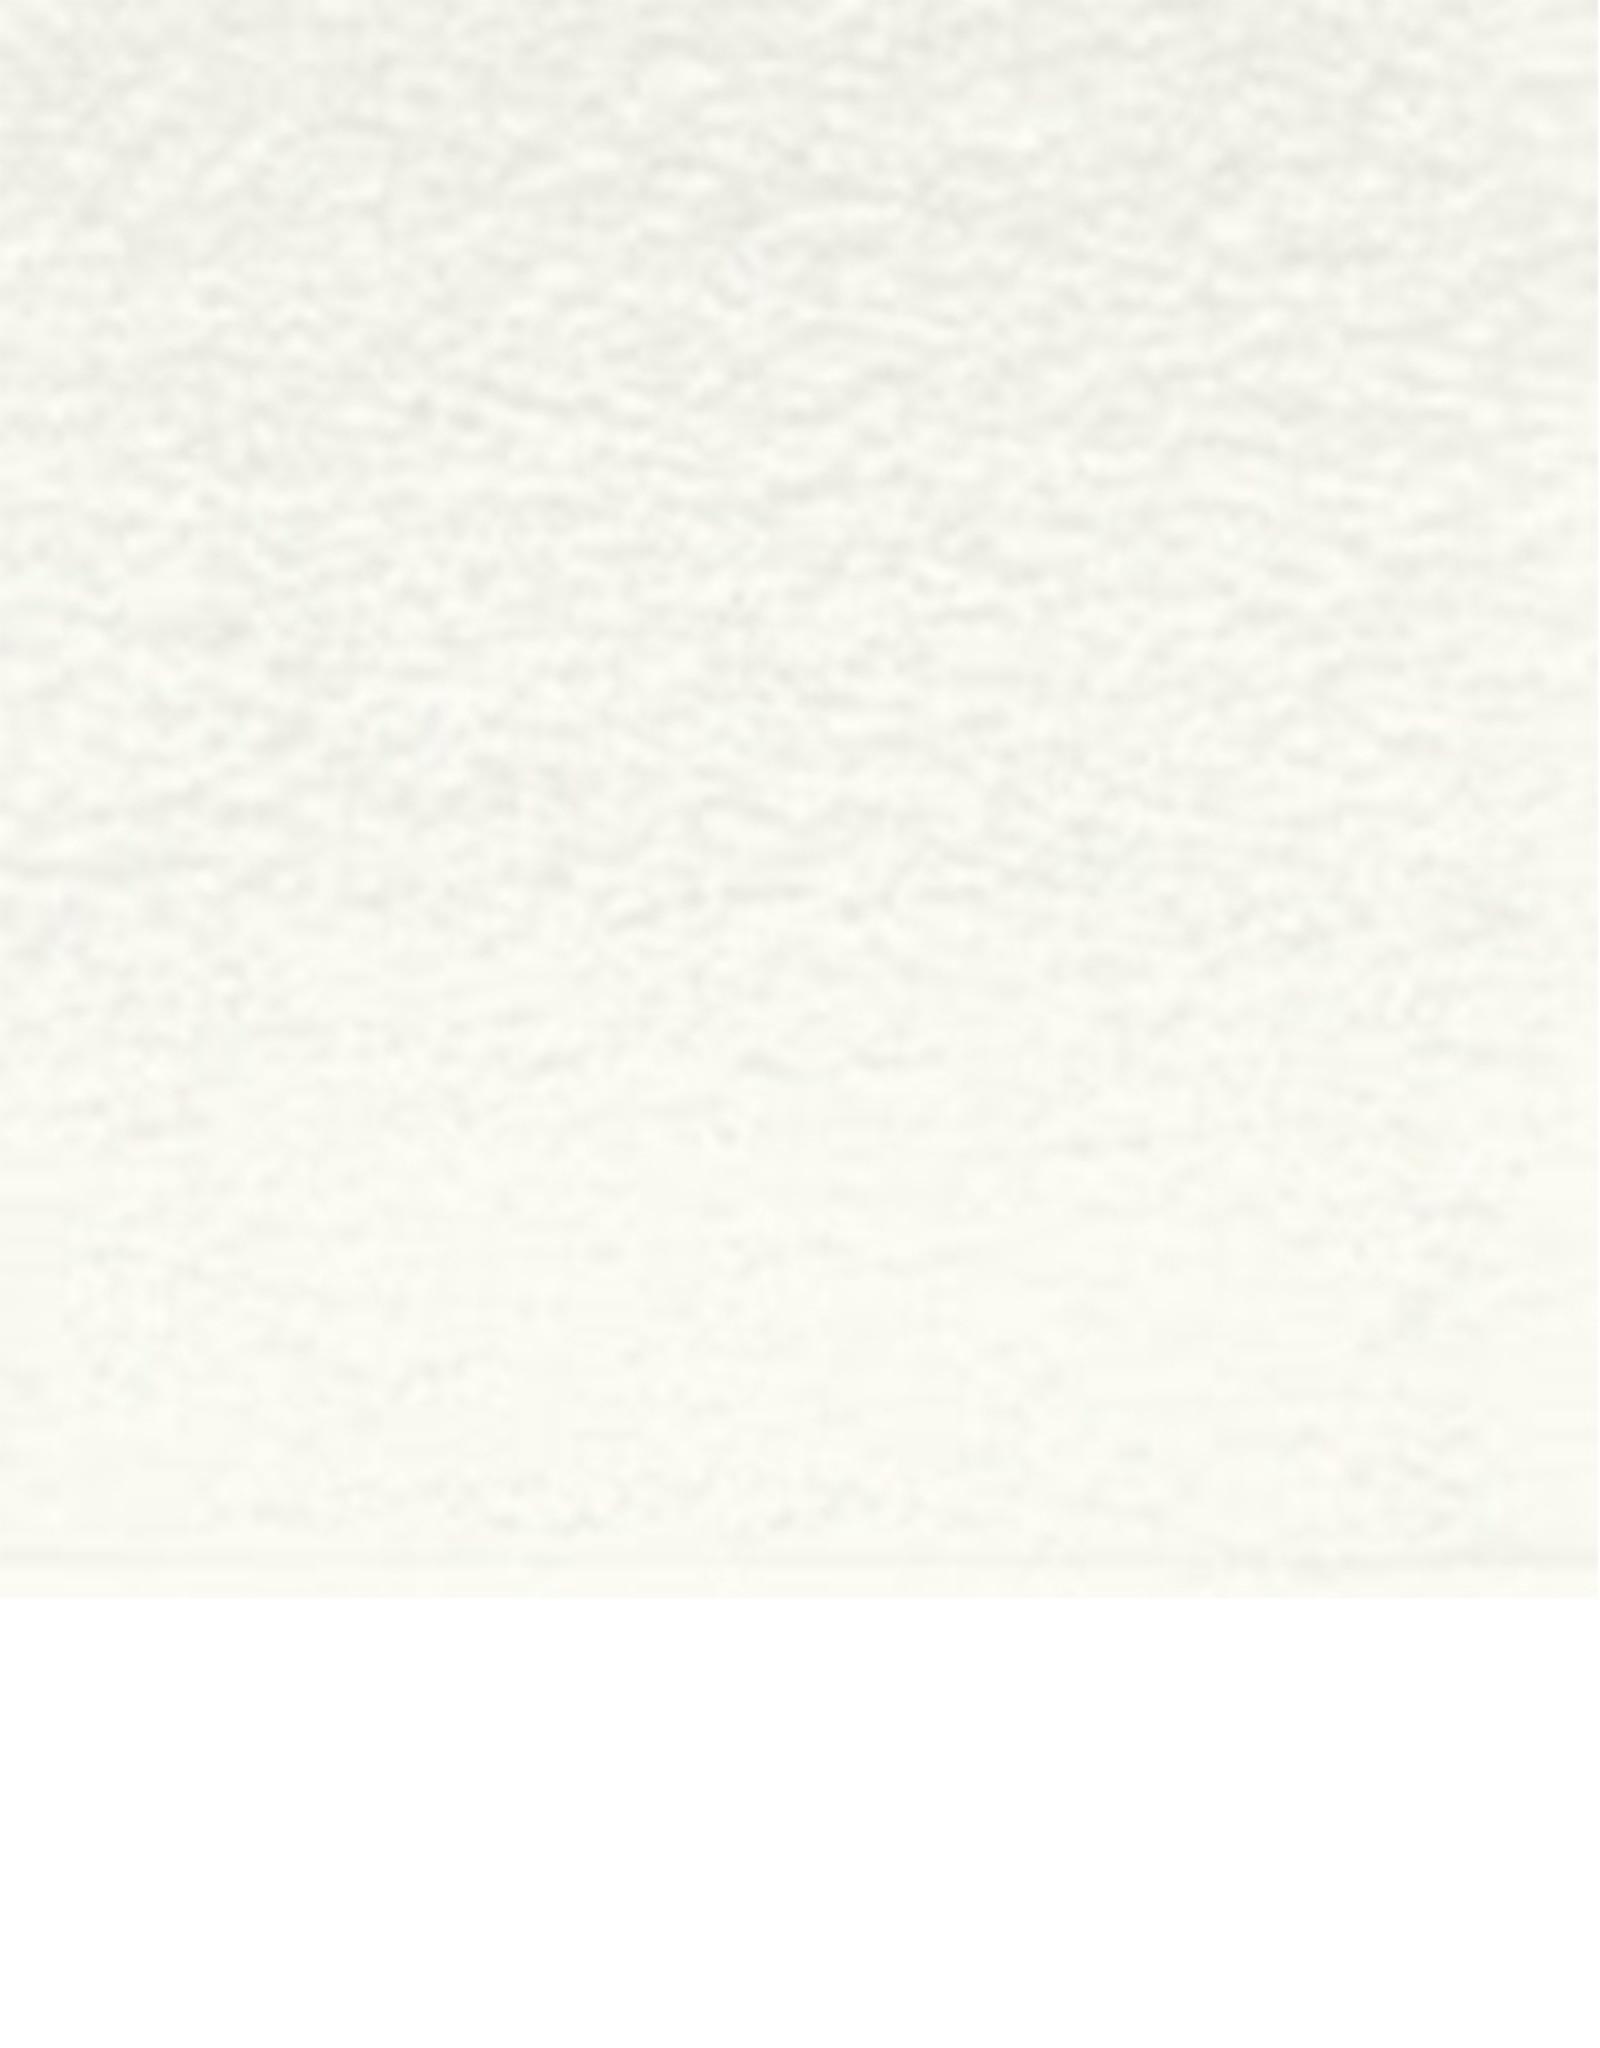 Inktense Pencil Antique White